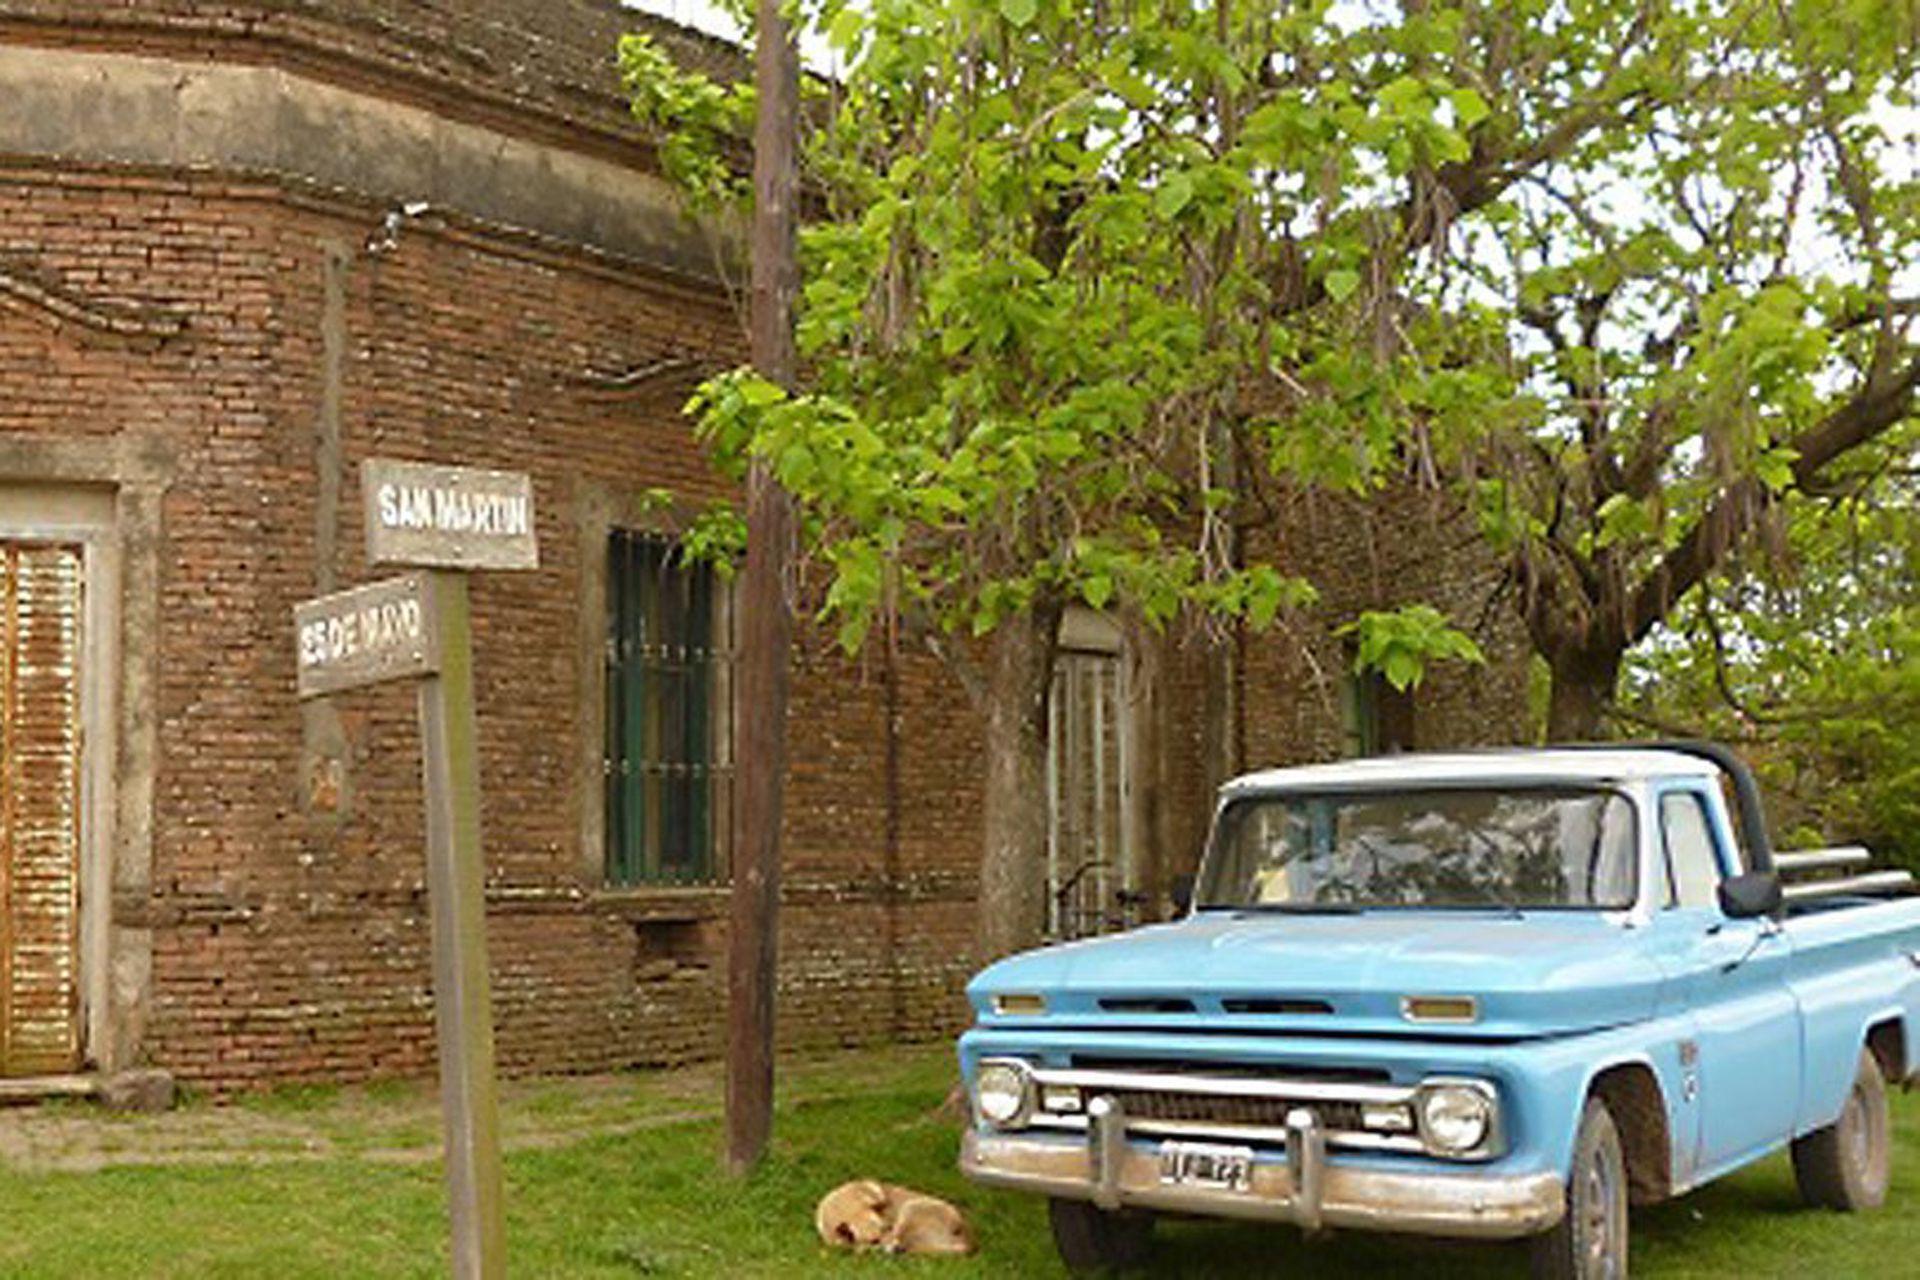 Villa Ruiz, a menos de 100 kilómetros de Buenos Aires